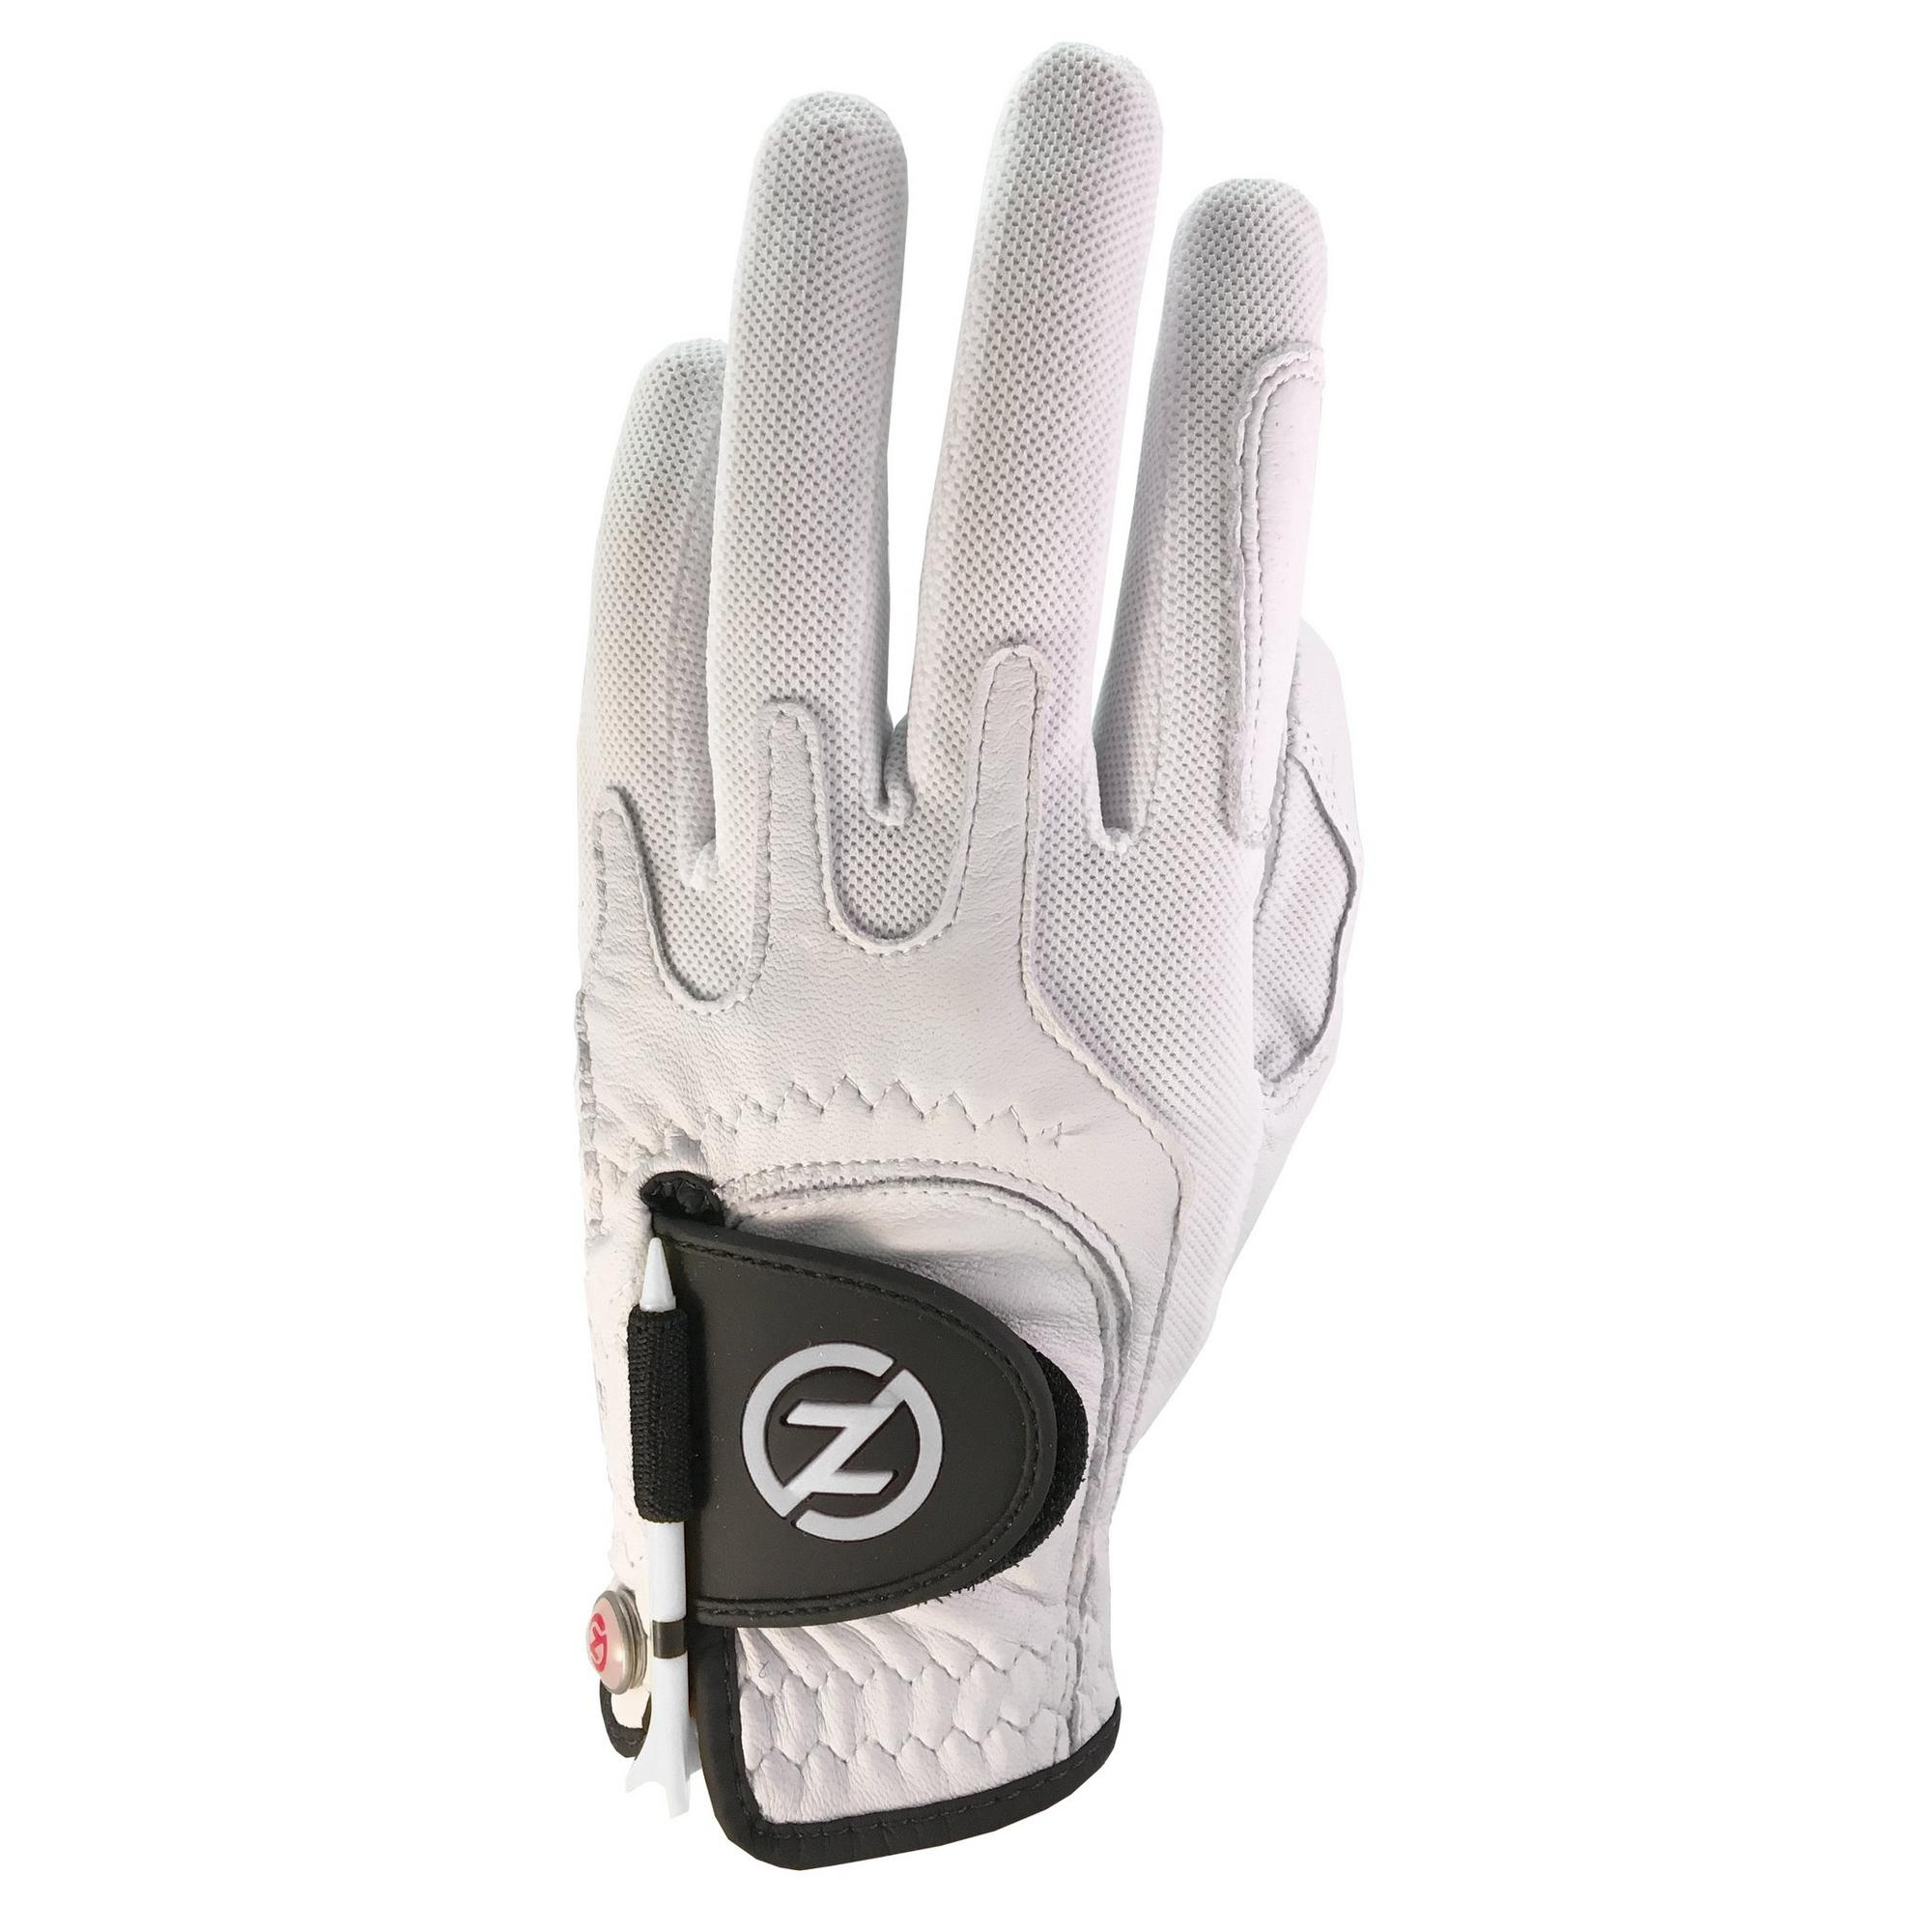 Men's Cabretta Elite Golf Glove - MRH